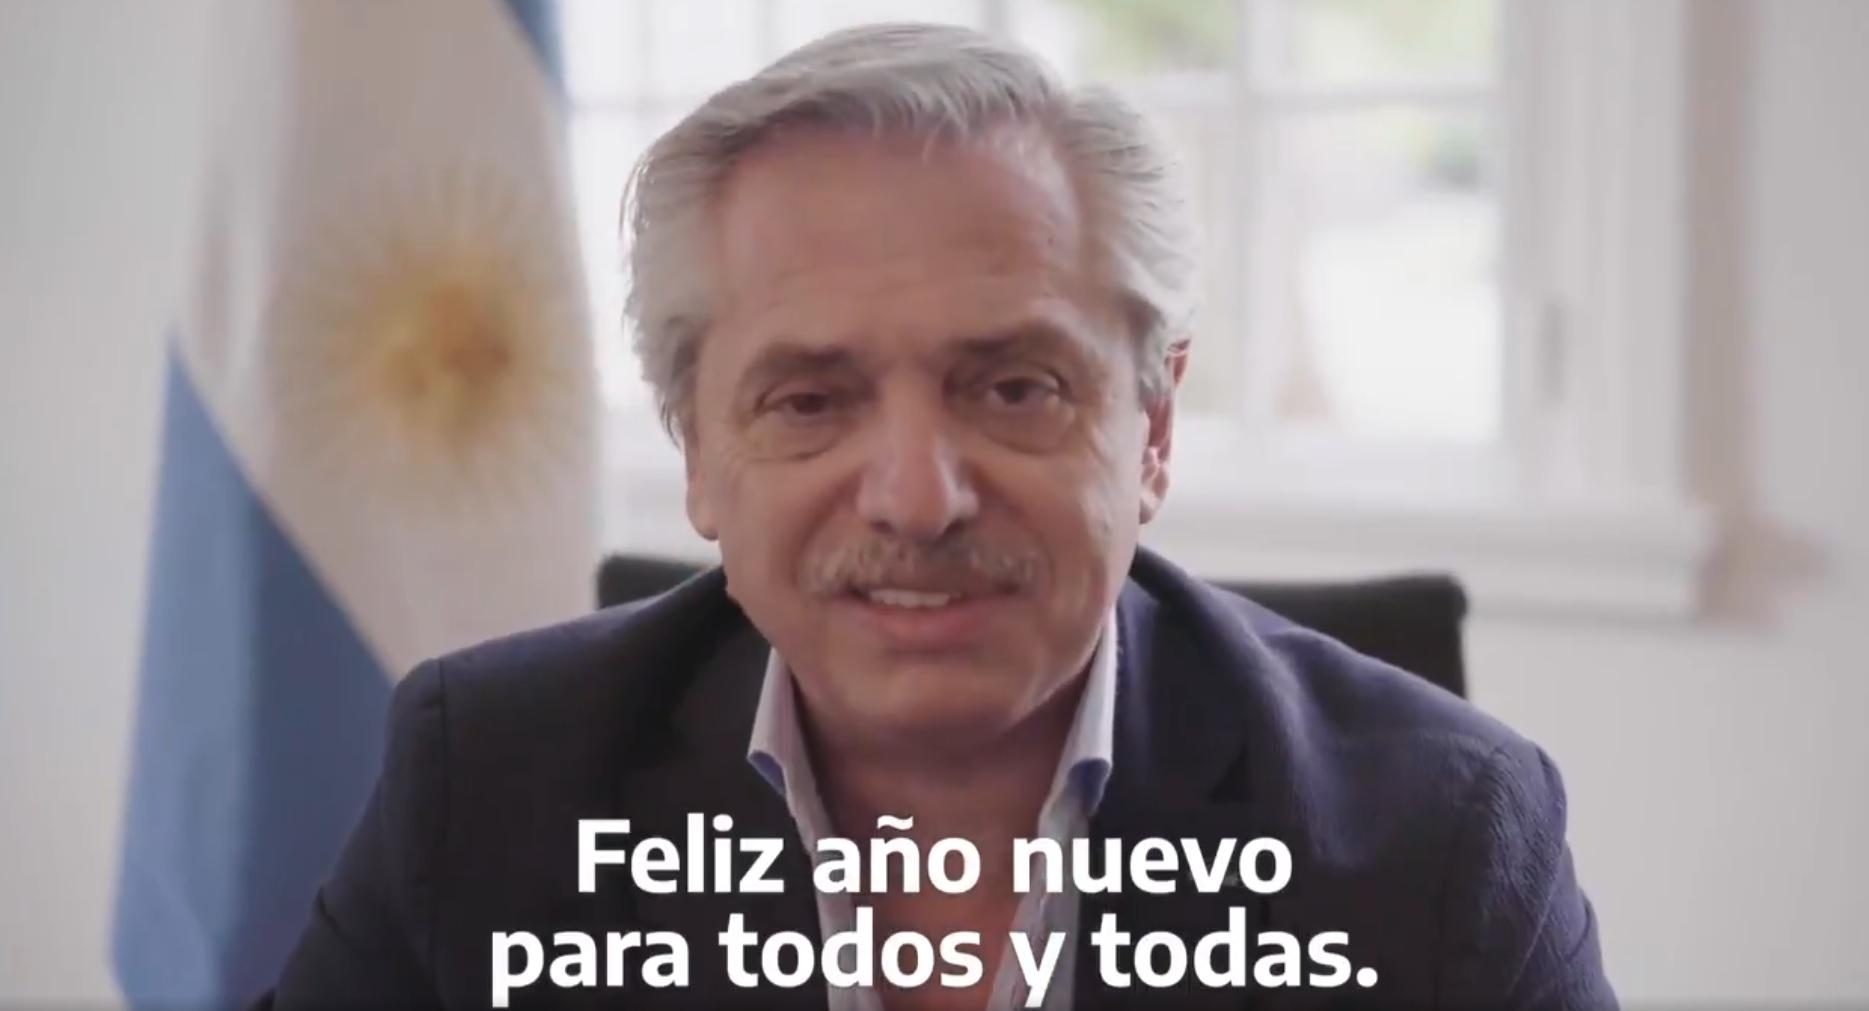 mensaje de Alberto Fernández